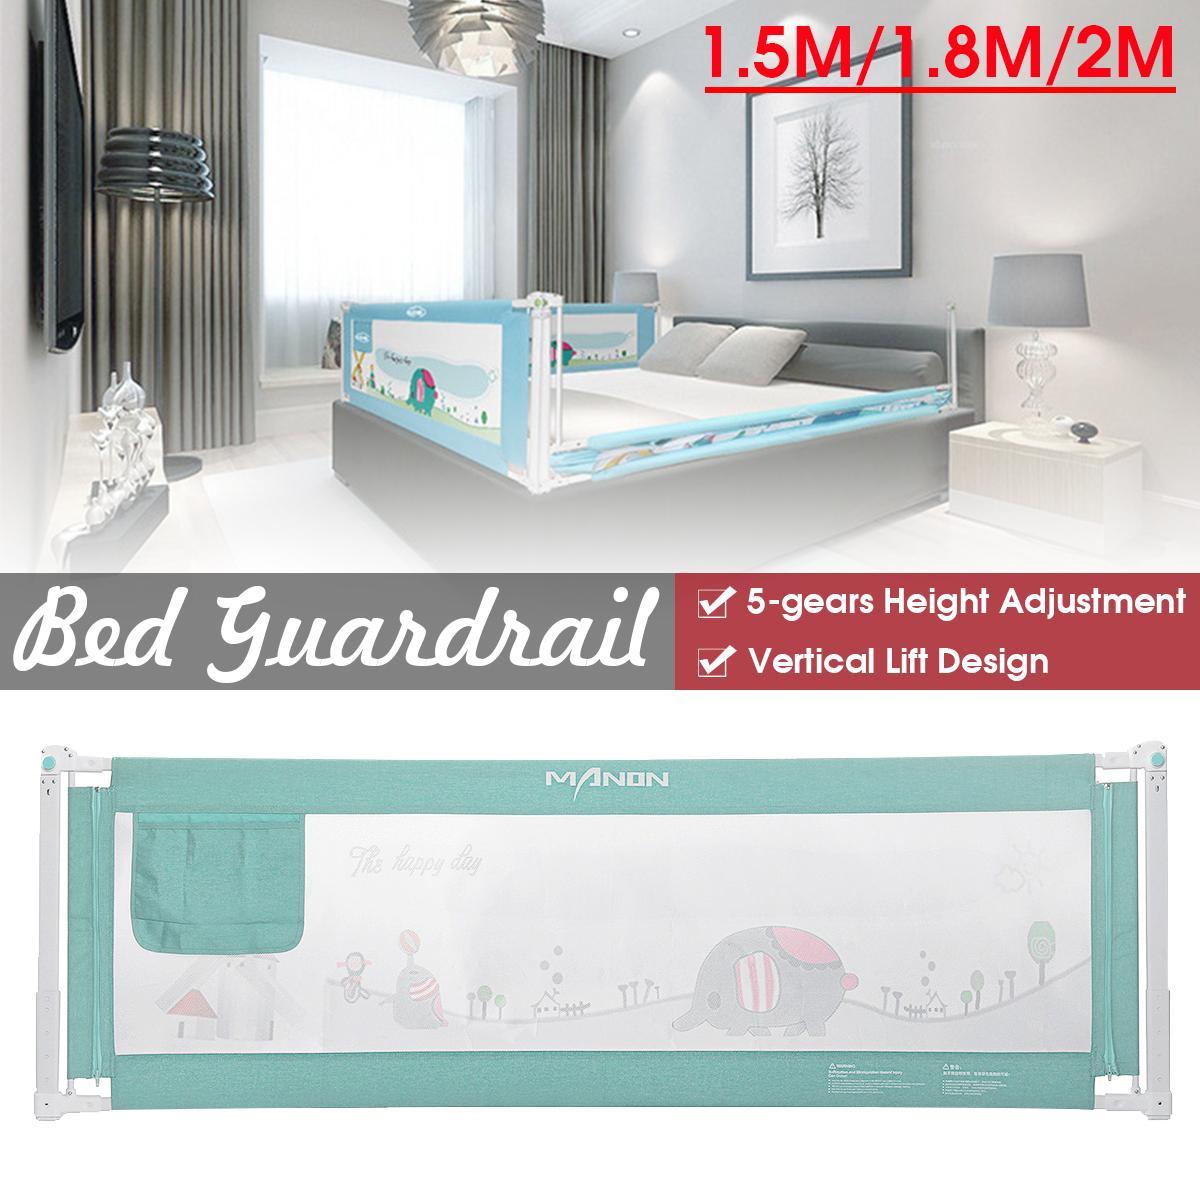 1.5M/1.8M/2M Green Baby Children Safety Fence Bed Guardrail Bumper Crib Rails